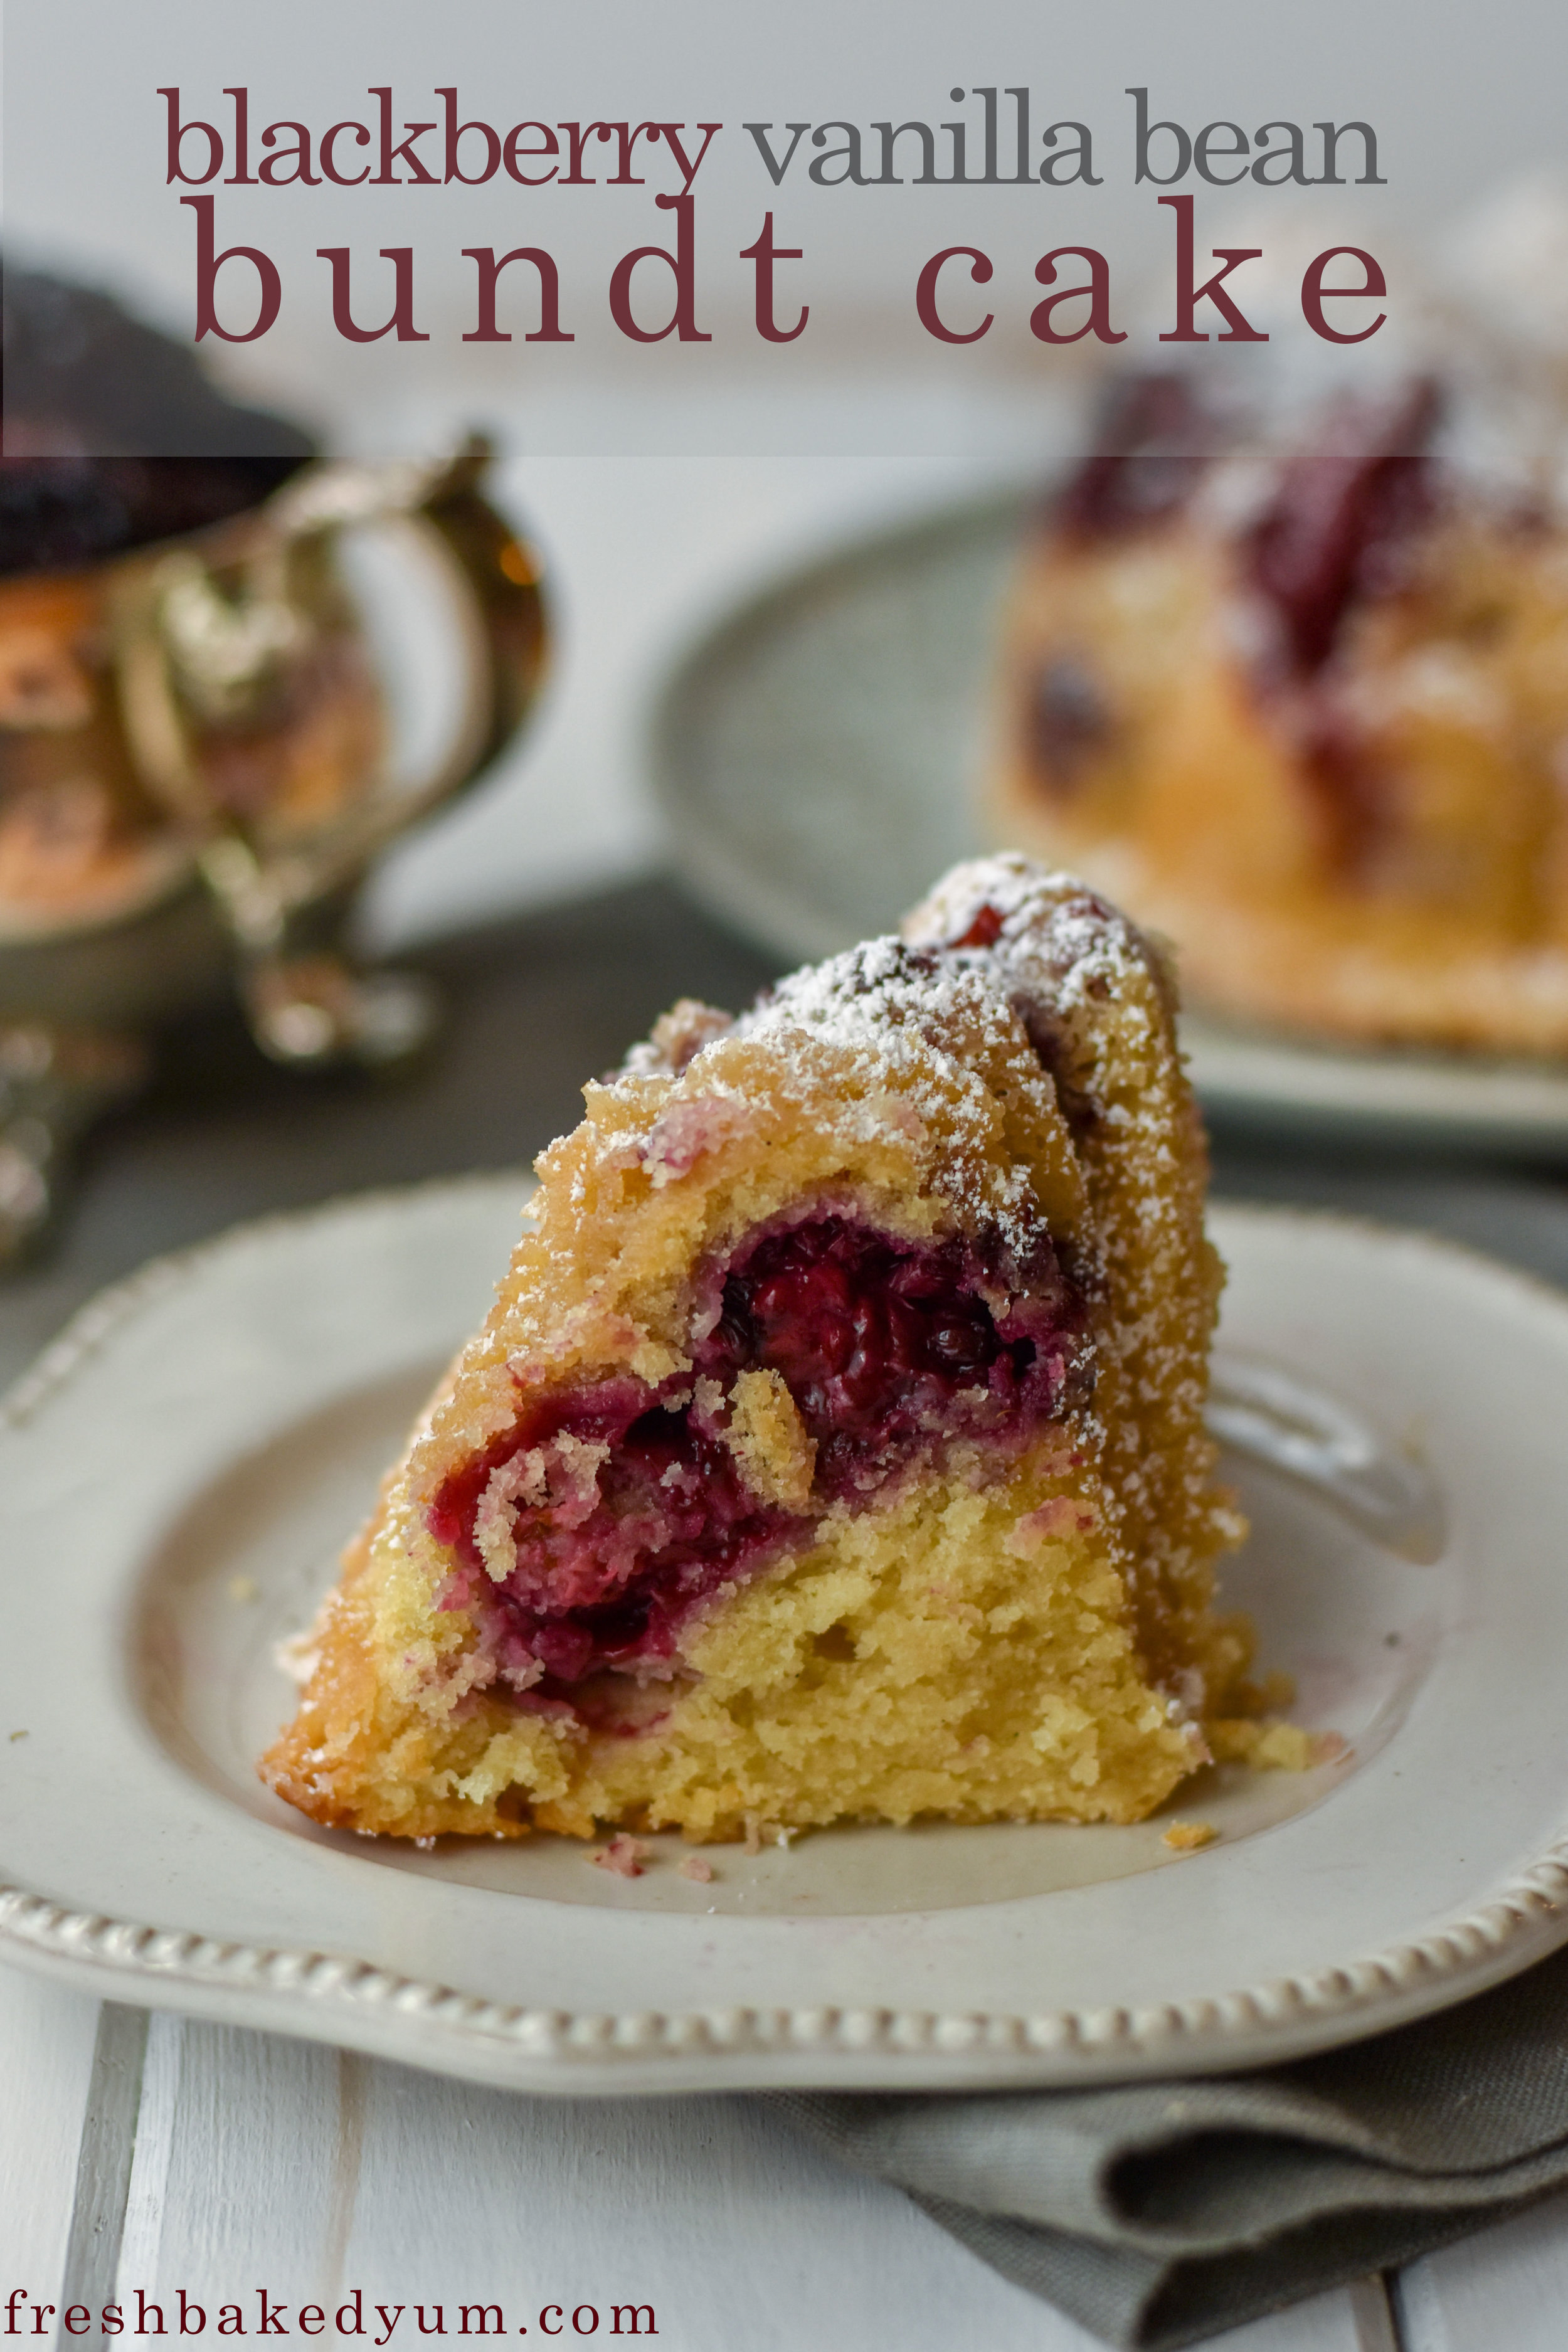 blackberry vanilla bean bundt cake recipe pinterest graphic 2.jpg